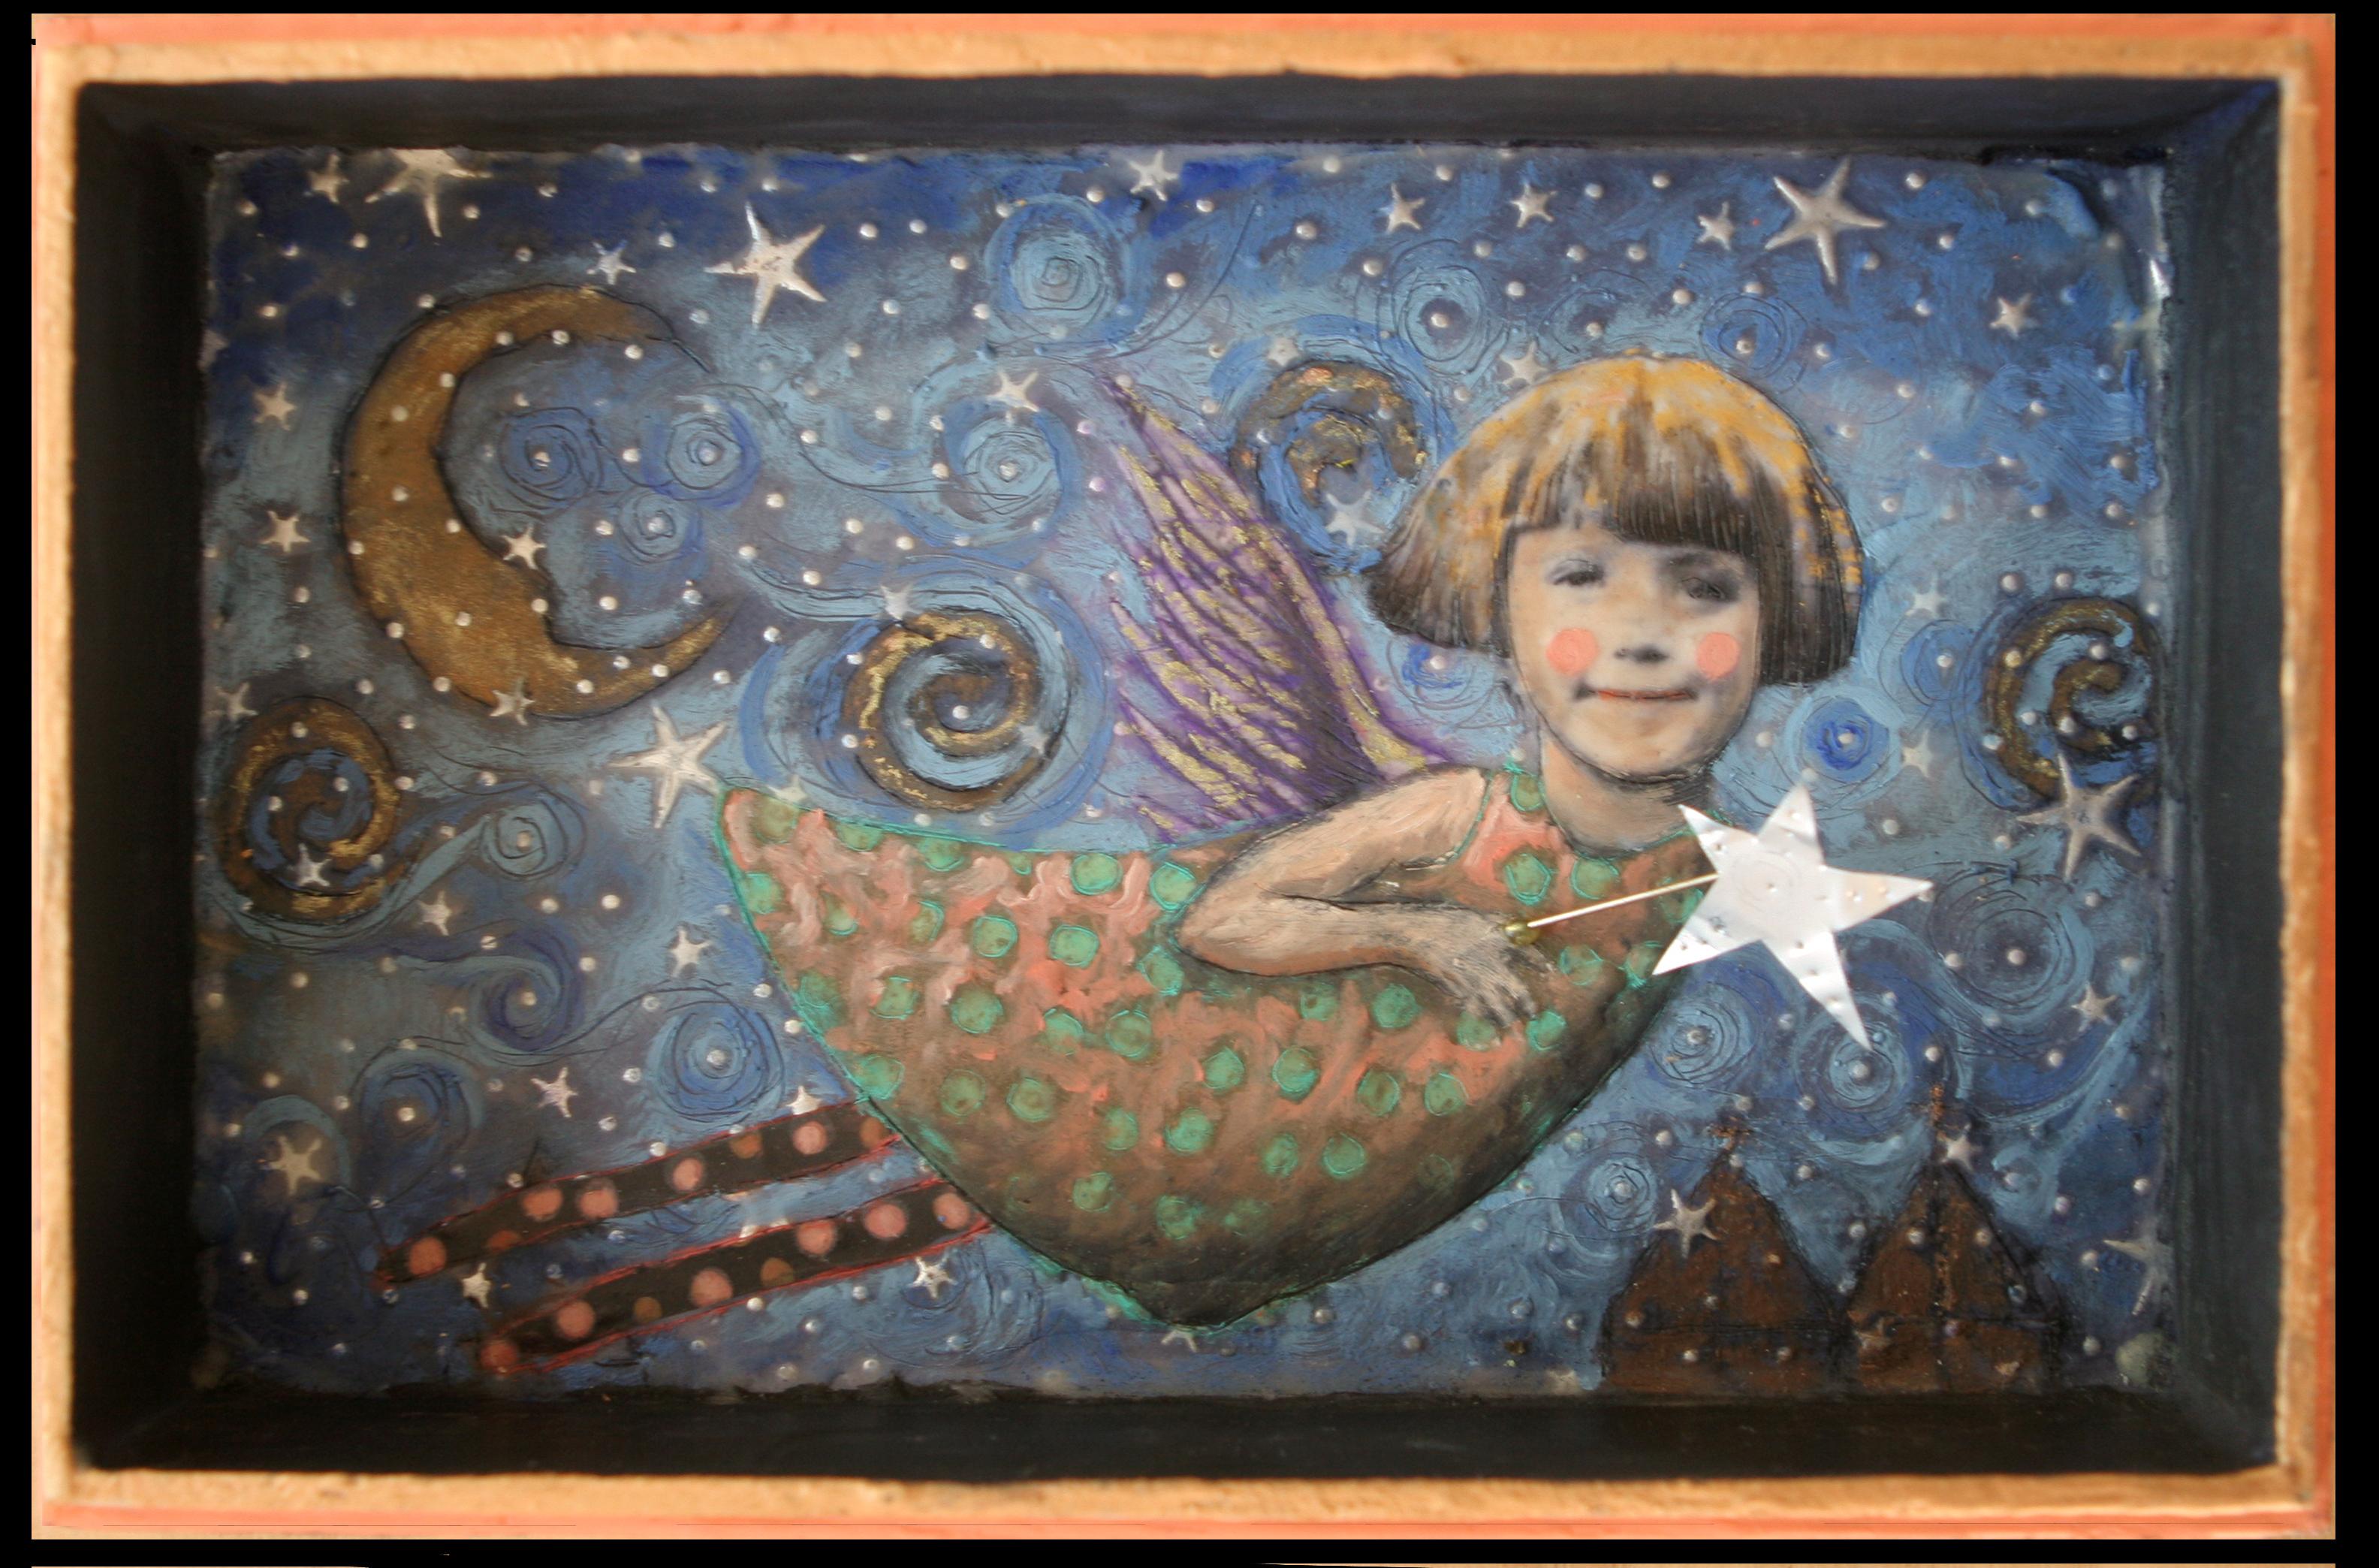 Angel Bep in StarryNight